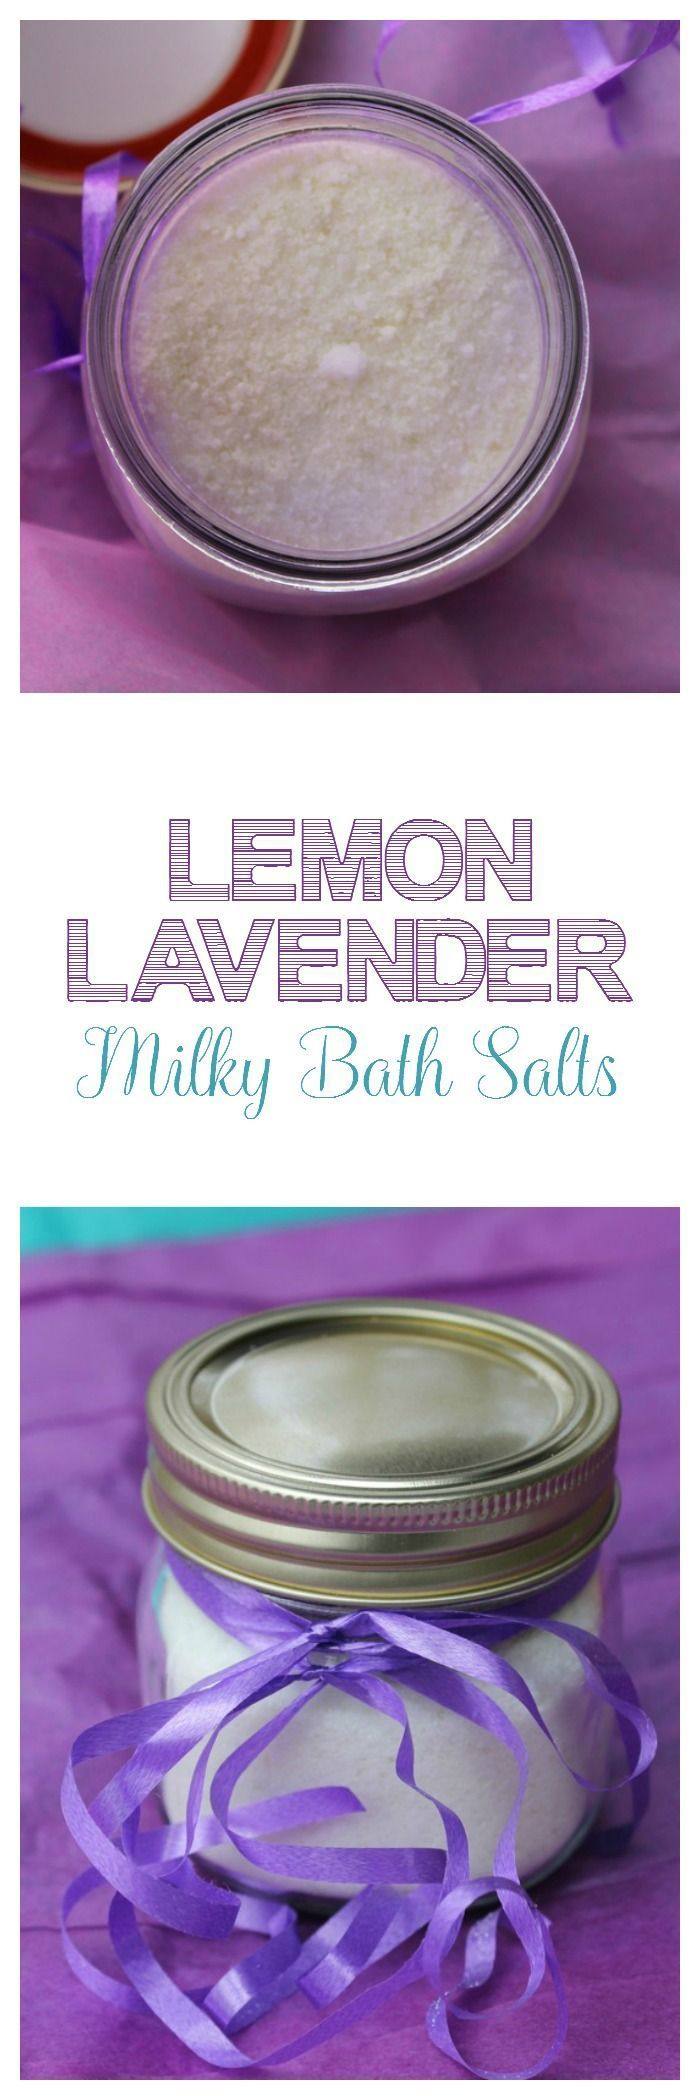 Lemon Lavender Milky Bath Salts DIY: Makes the perfect Mother's Day gift idea! #LemonSaltScrubRecipe